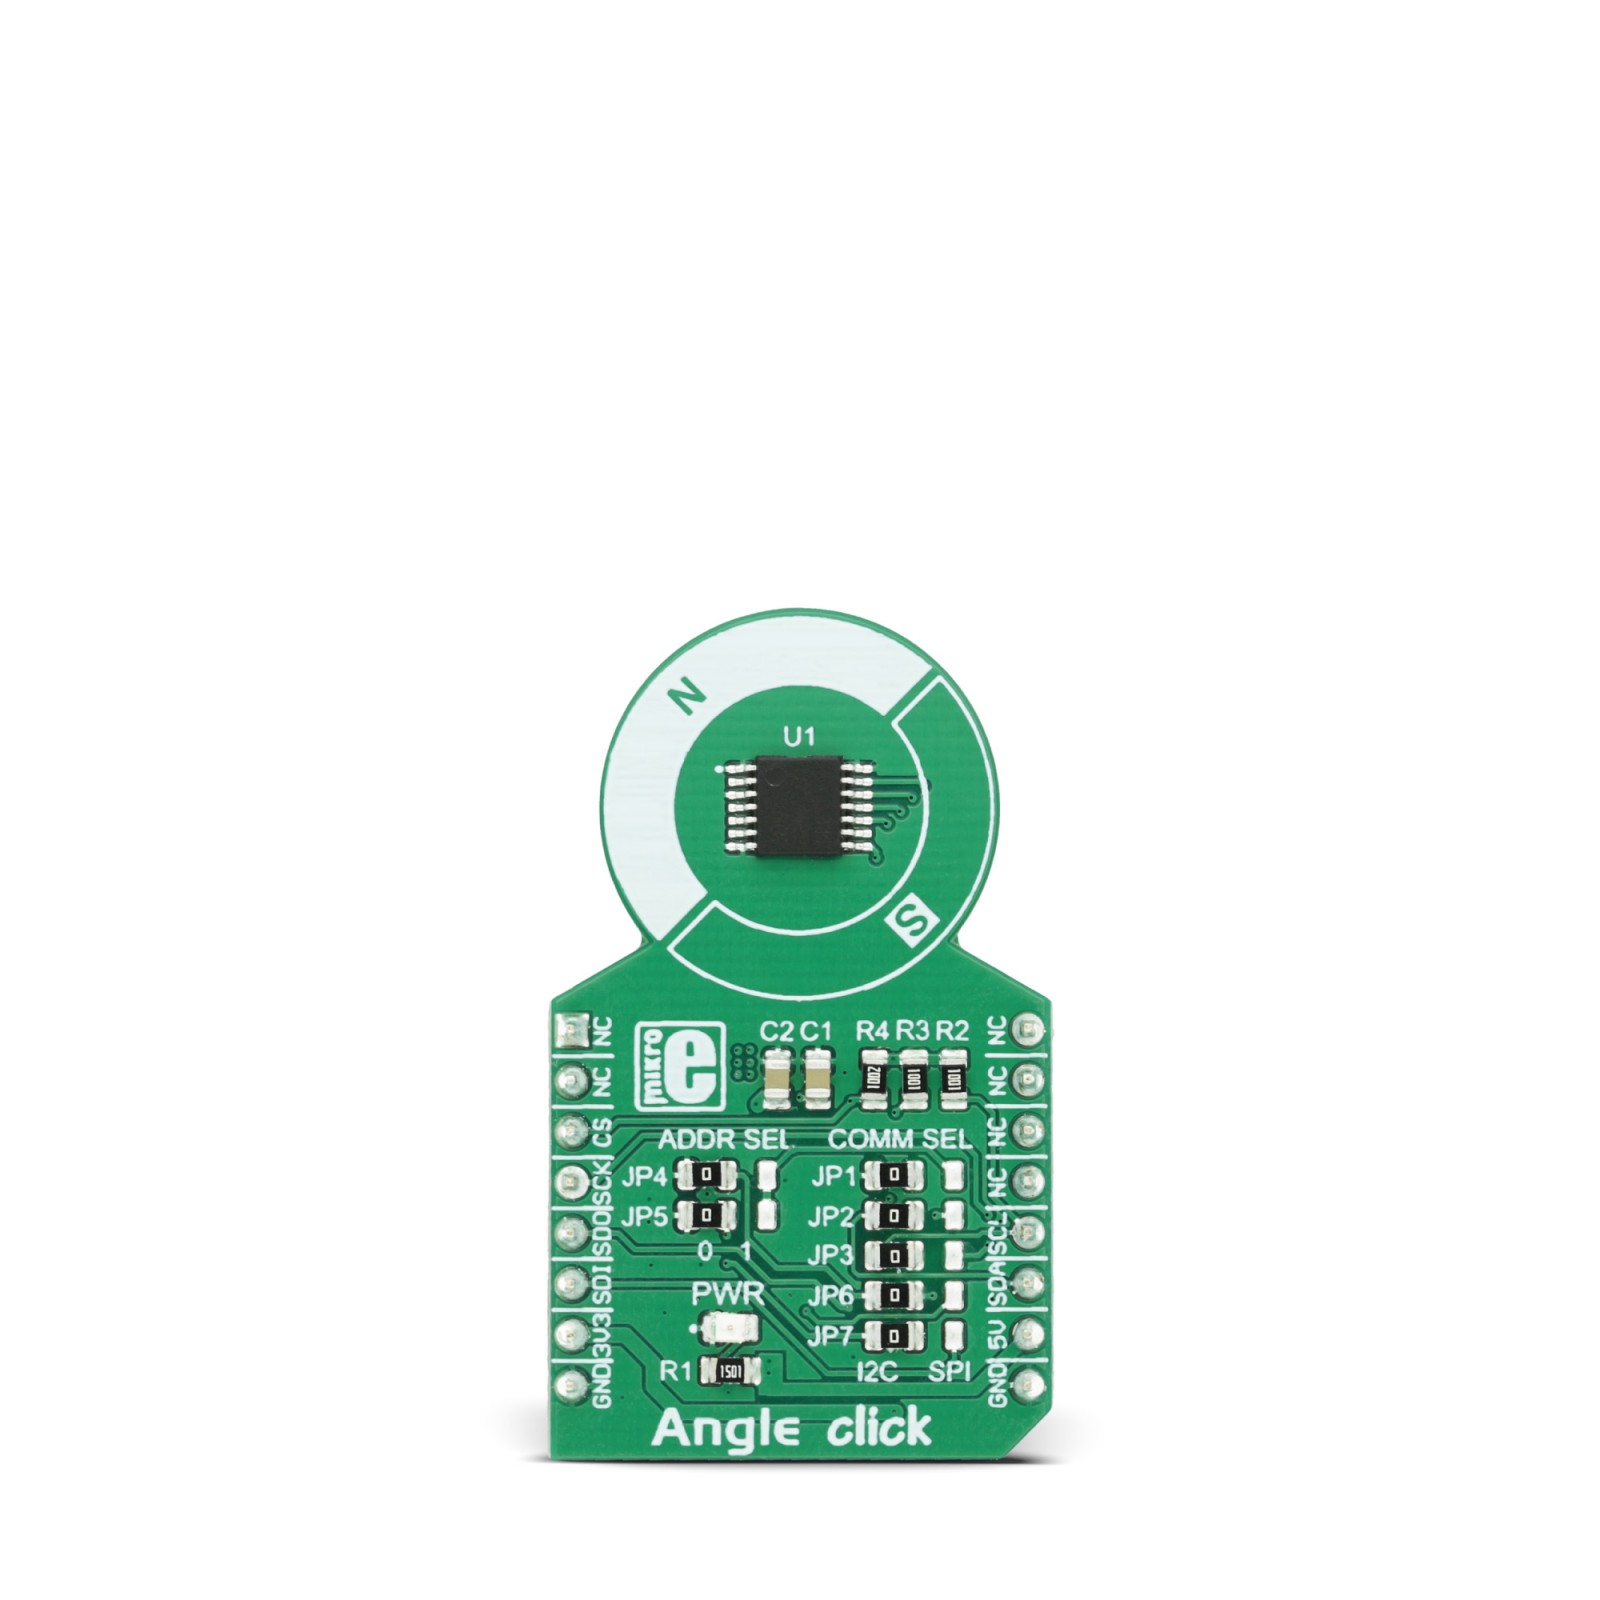 Angle Click Mikroelektronika Lets Take A Look At The Spi Timing Diagram For Mode 1 Mgctlbxnmzp Mgctlbxv5112 Mgctlbxlc Mgctlbxpprestashop